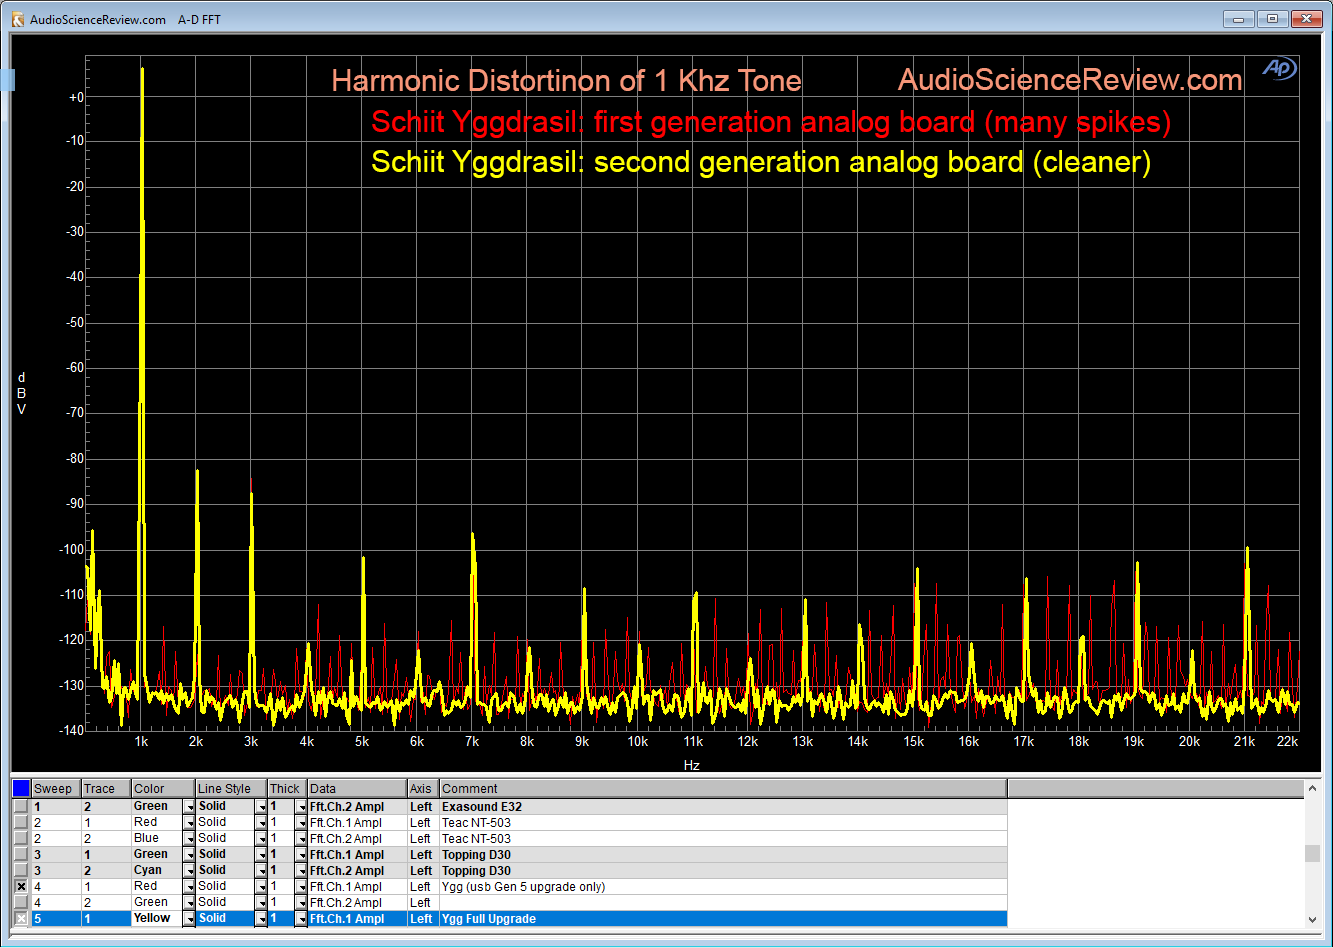 Schiit Yggdrasil DAC Harmonic Distortion Measurement.png